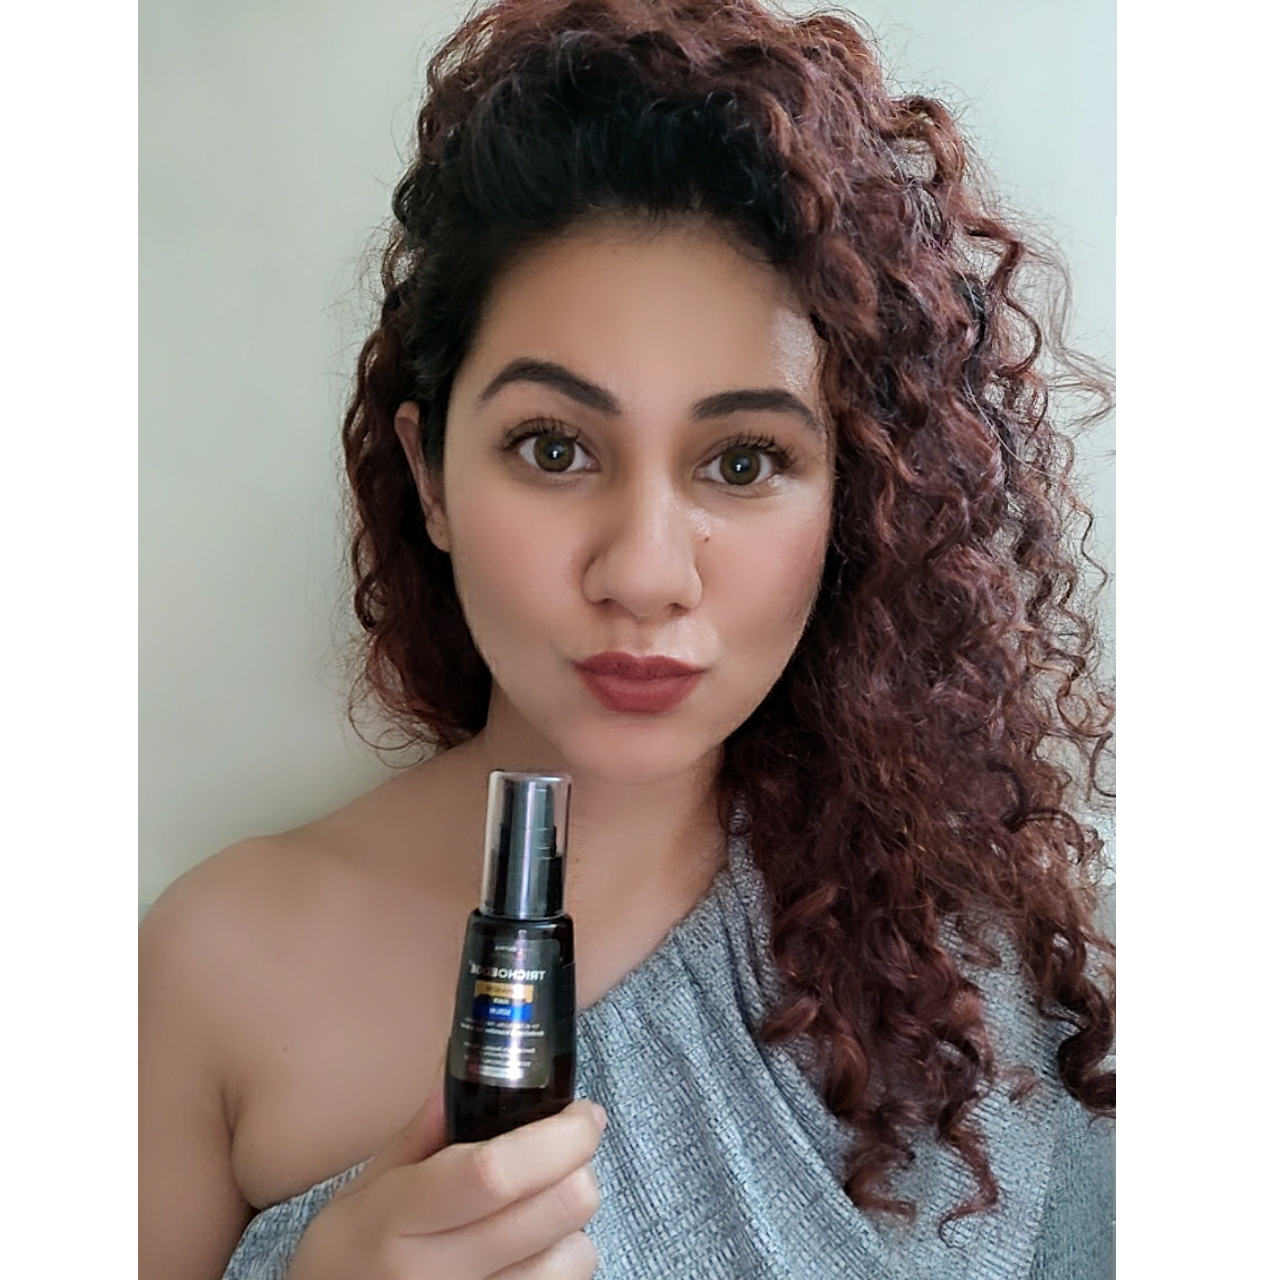 Derma Essentia Trichoedge Advanced Hair Serum pic 2-The best hair serum which is dermatologically tested-By garima.sharma28